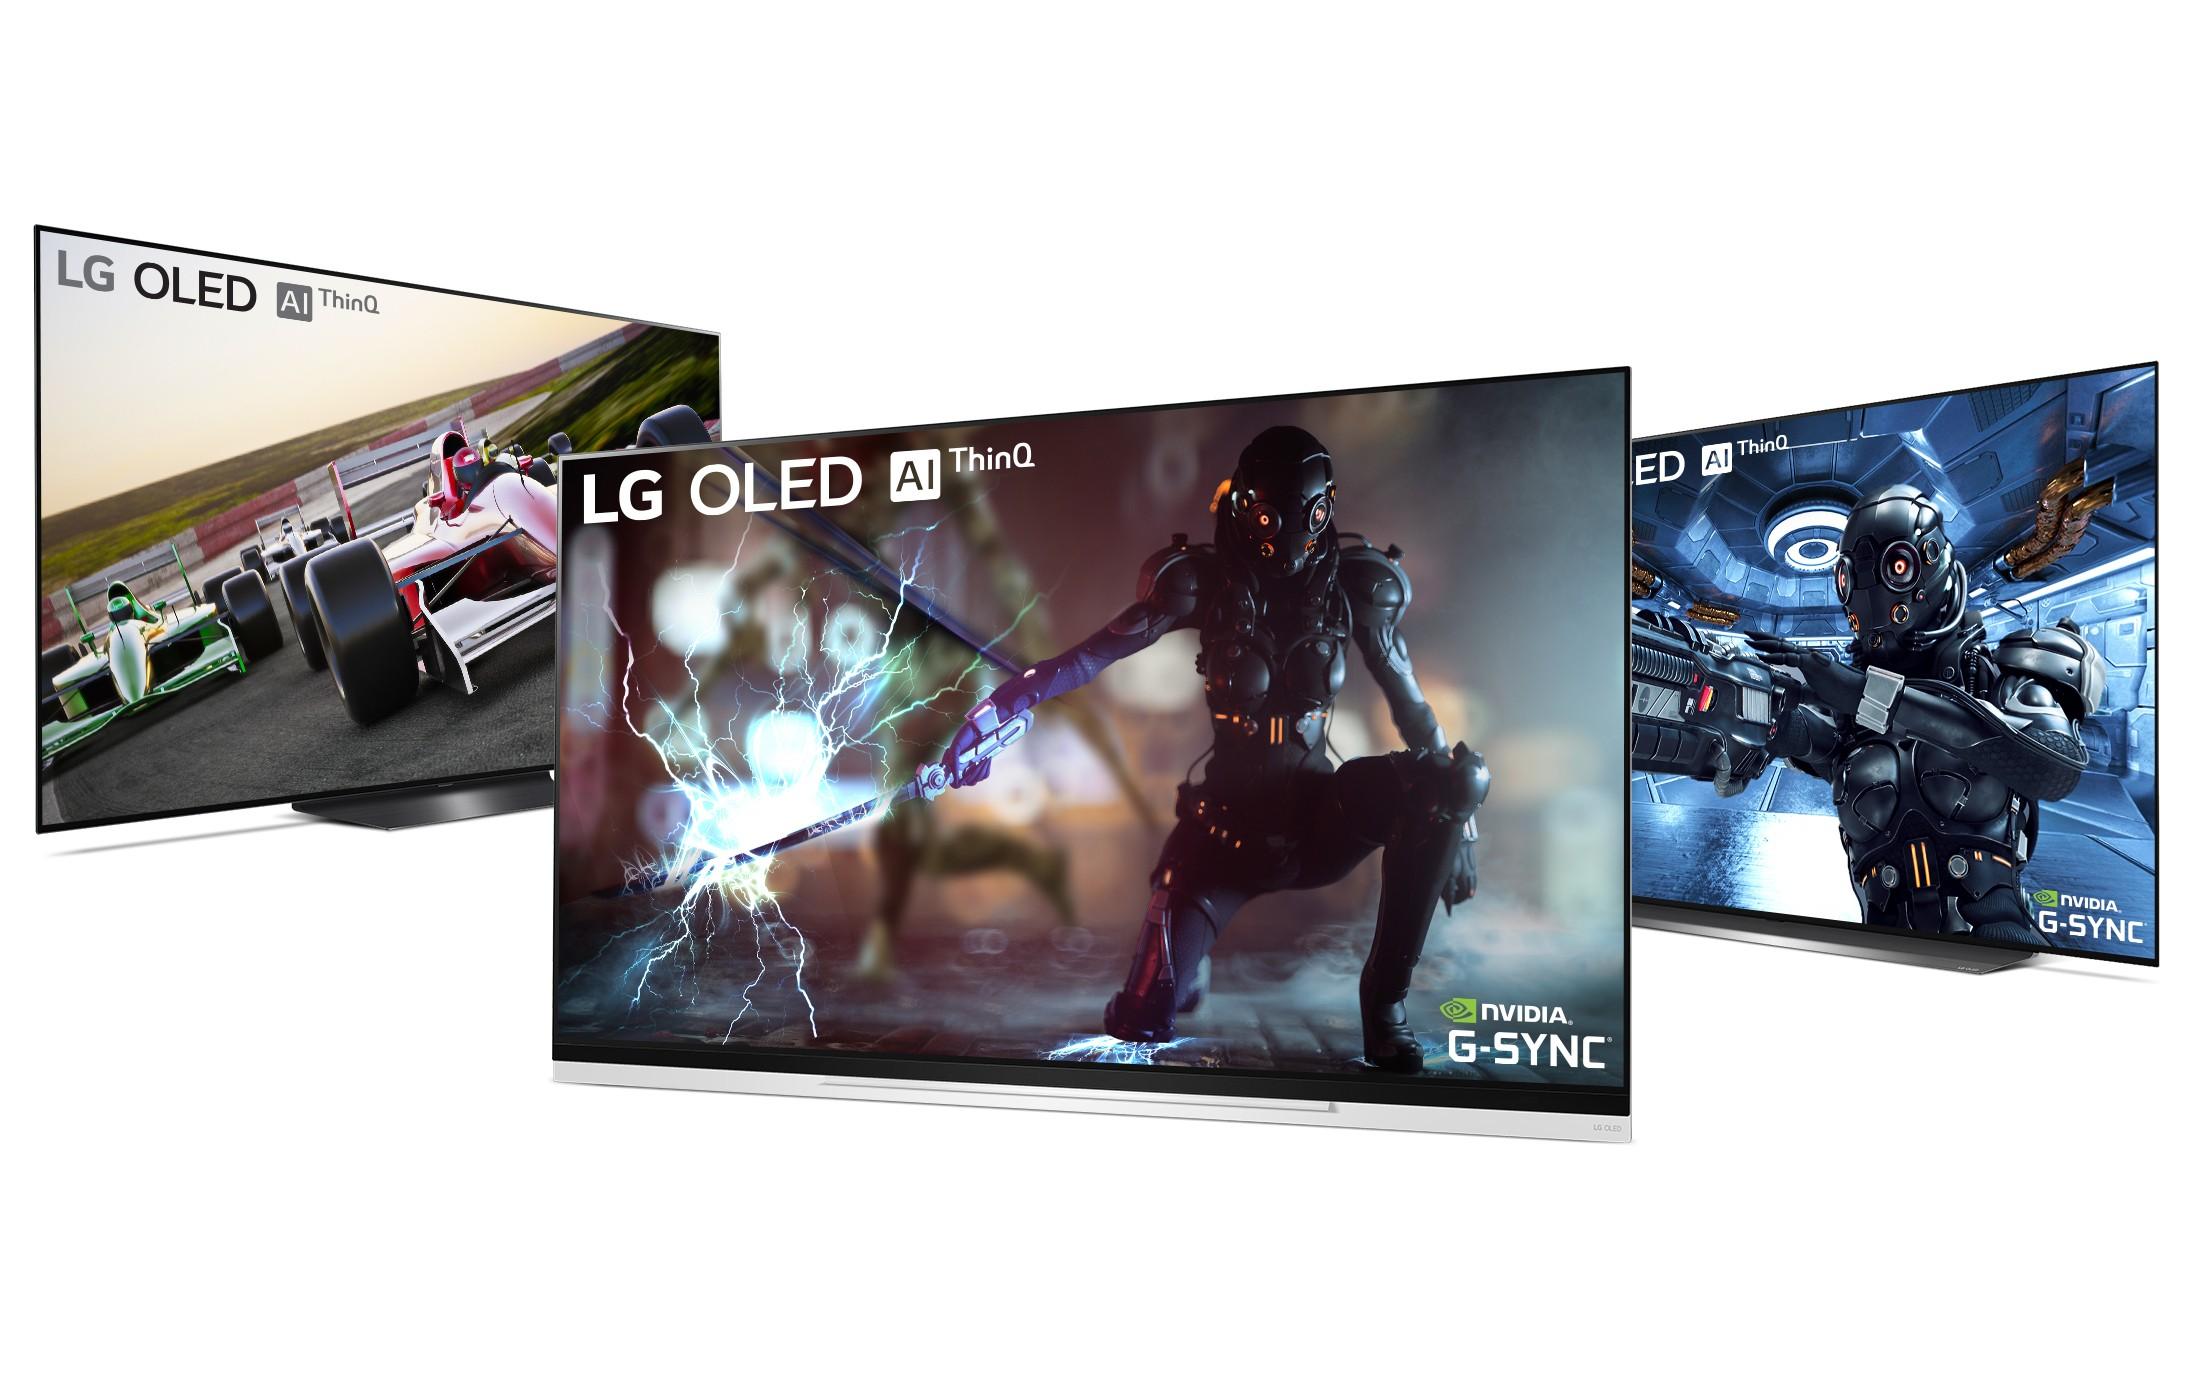 NVIDIA G-SYNC on LG OLED TV models E9, C9 and B9.